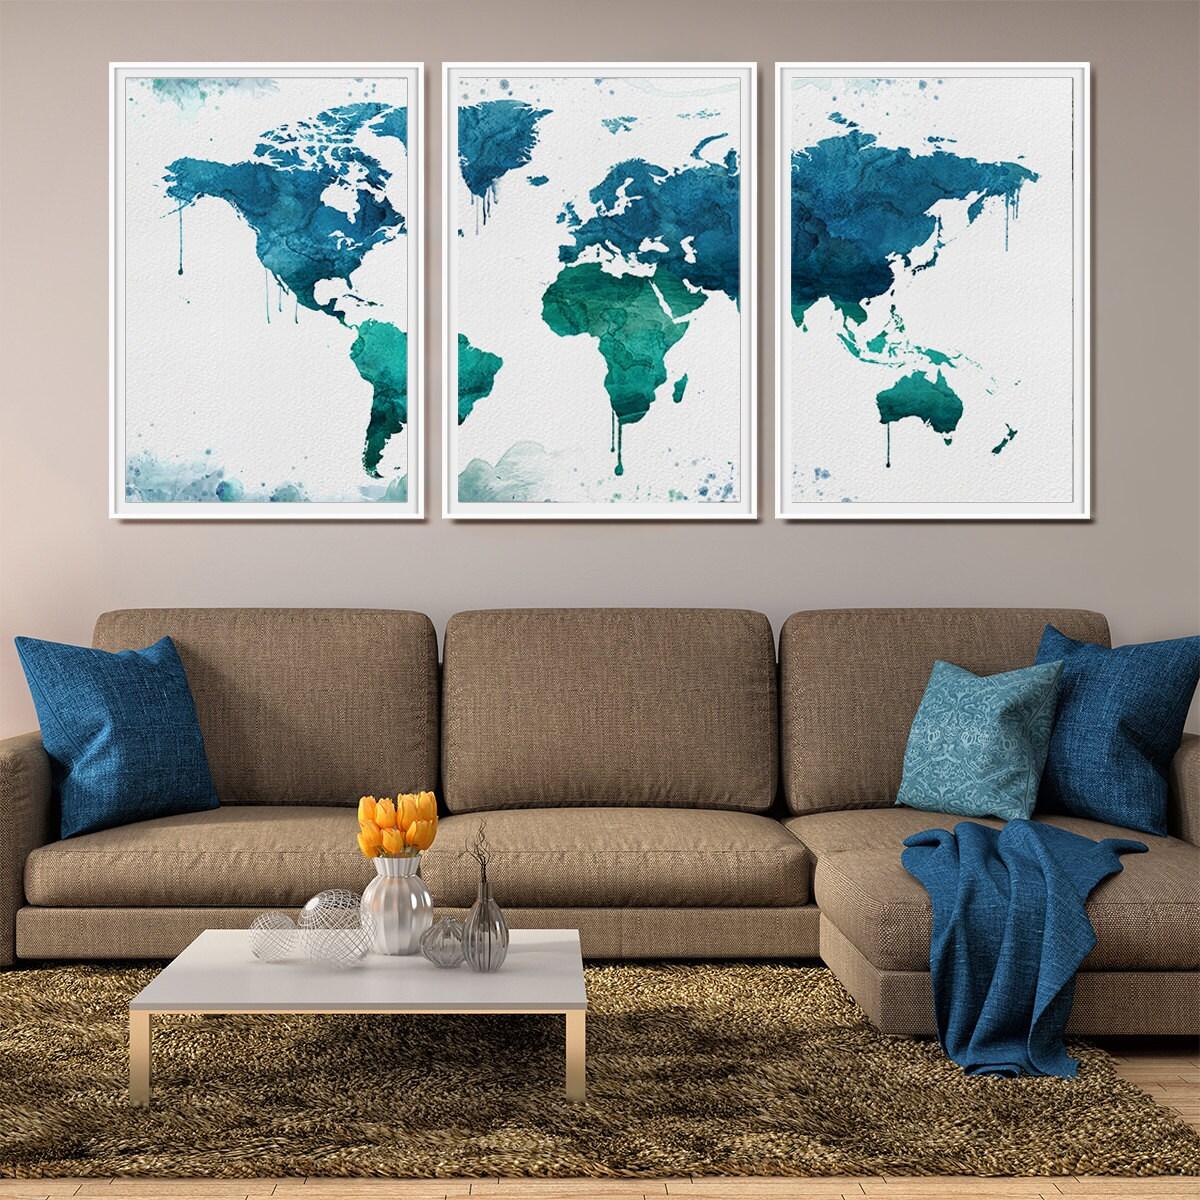 World map art print large wall art world map poster for World map wall art